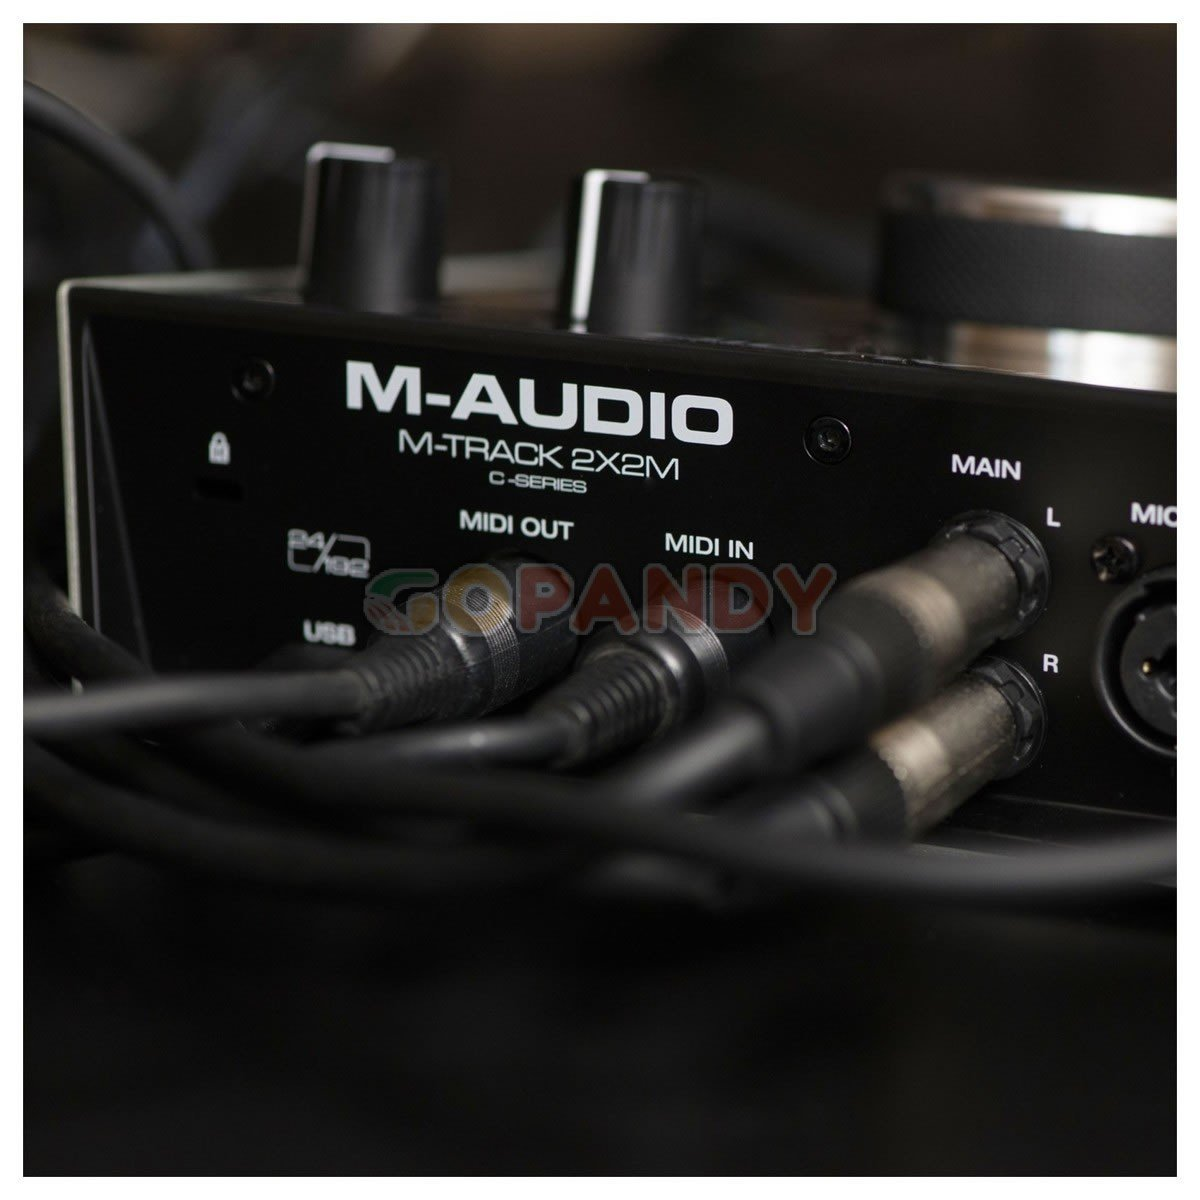 maudio-2x2m-03